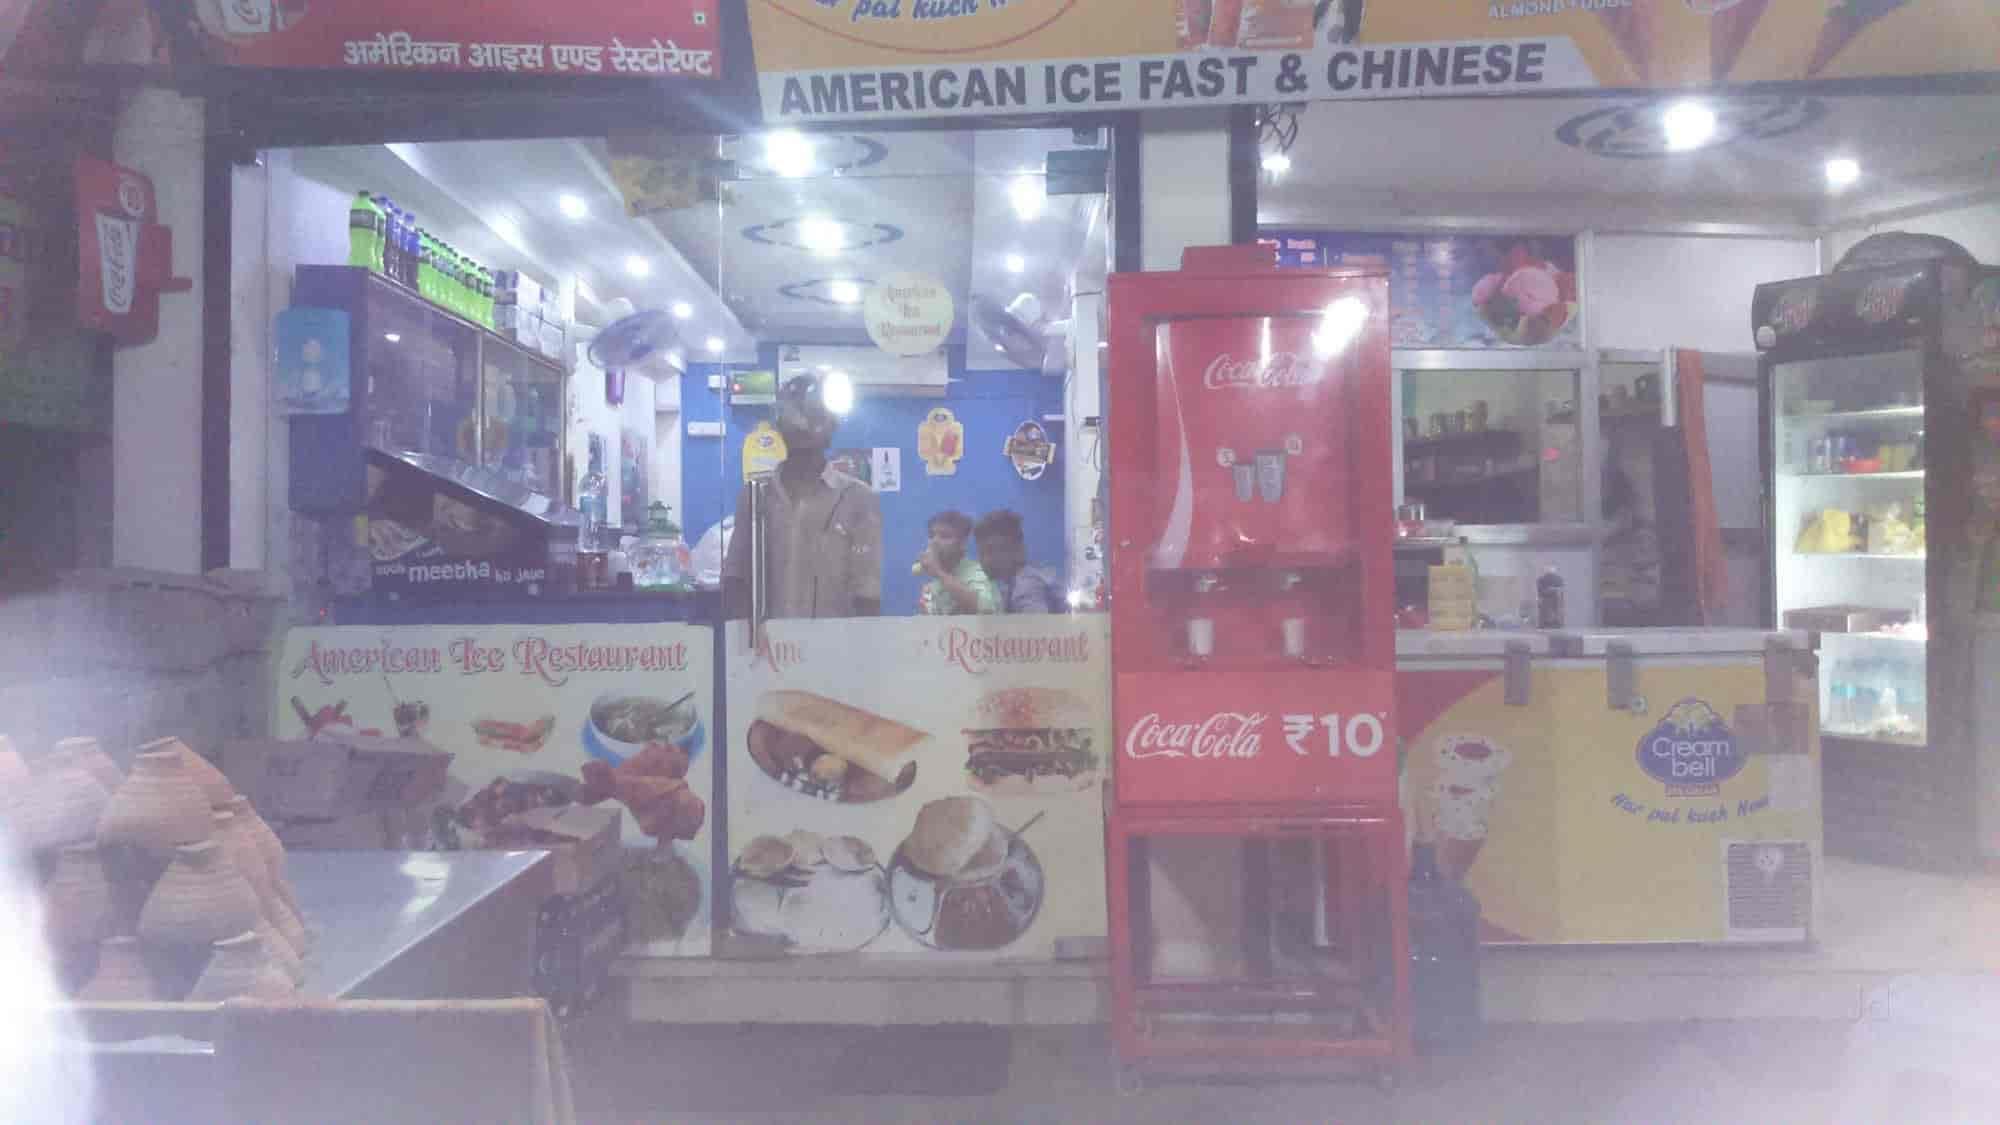 American Ice Restaurant Mahewa Allahabad Restaurants Justdial